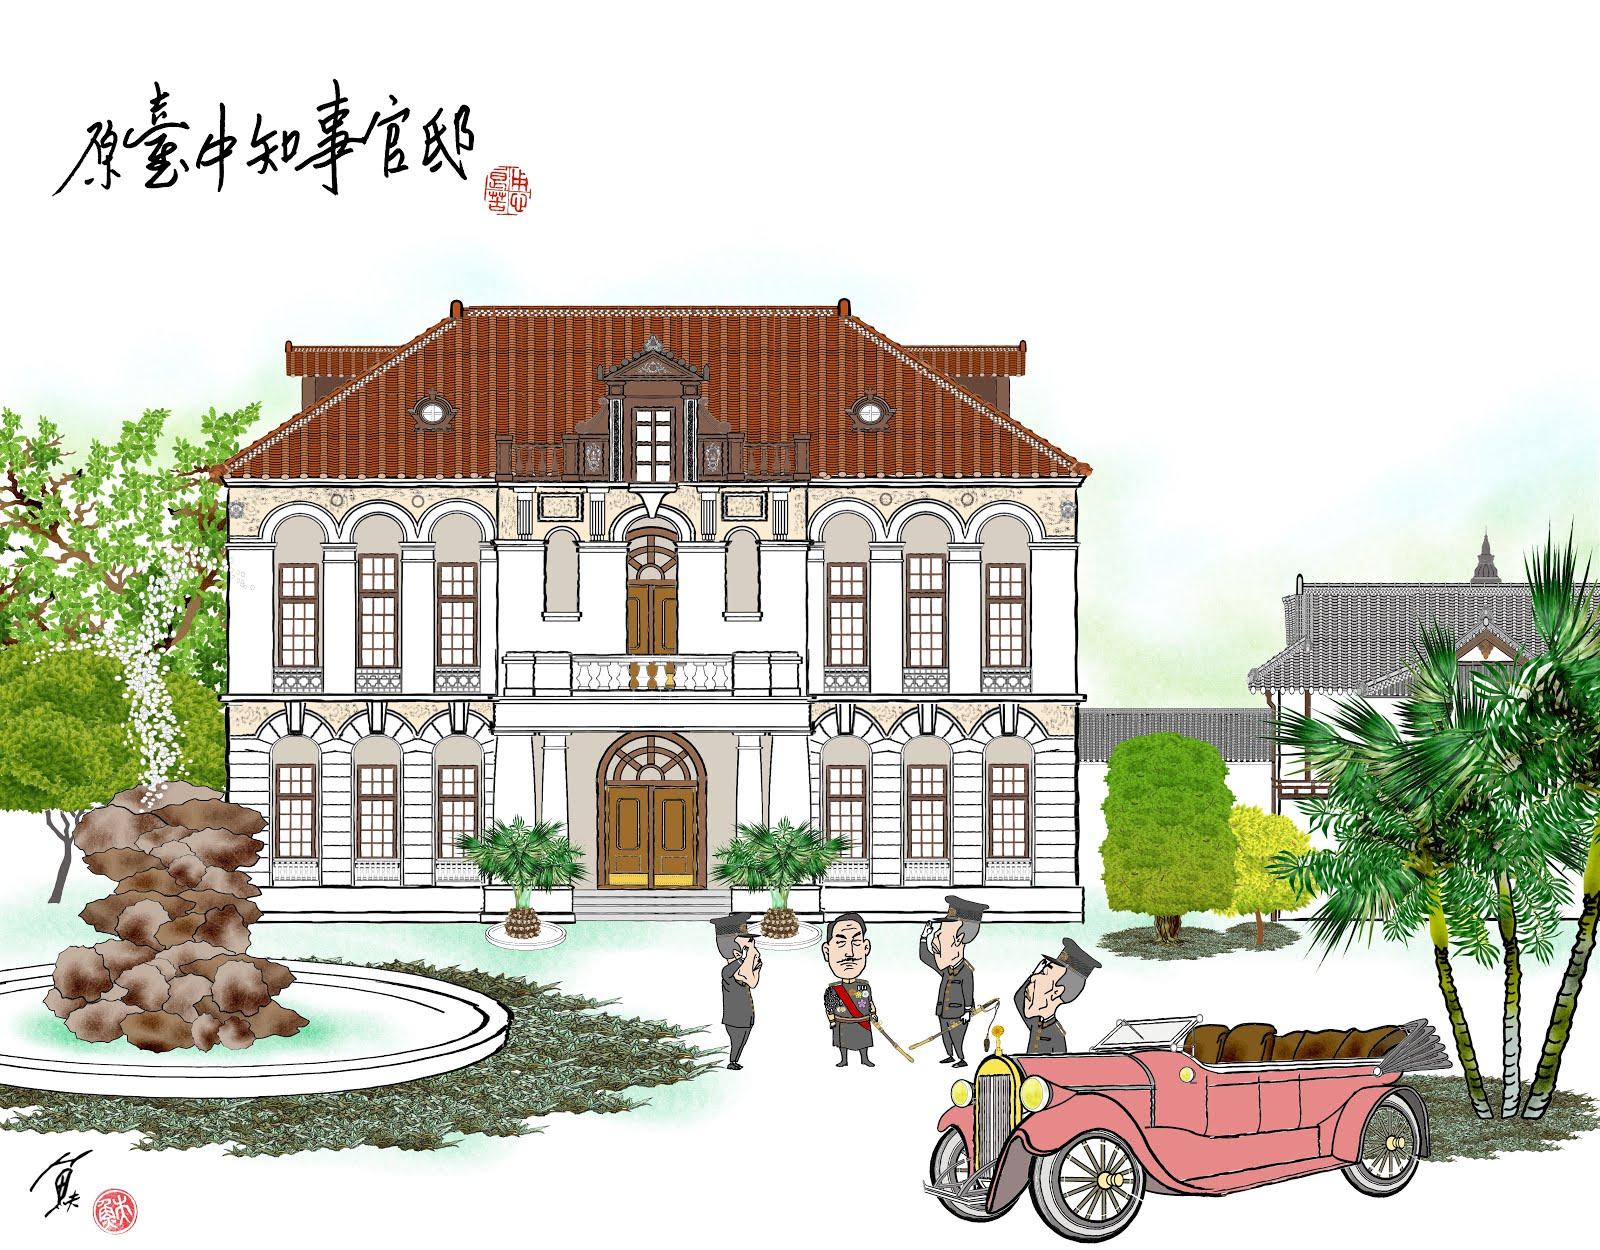 prefecturejpg.jpg